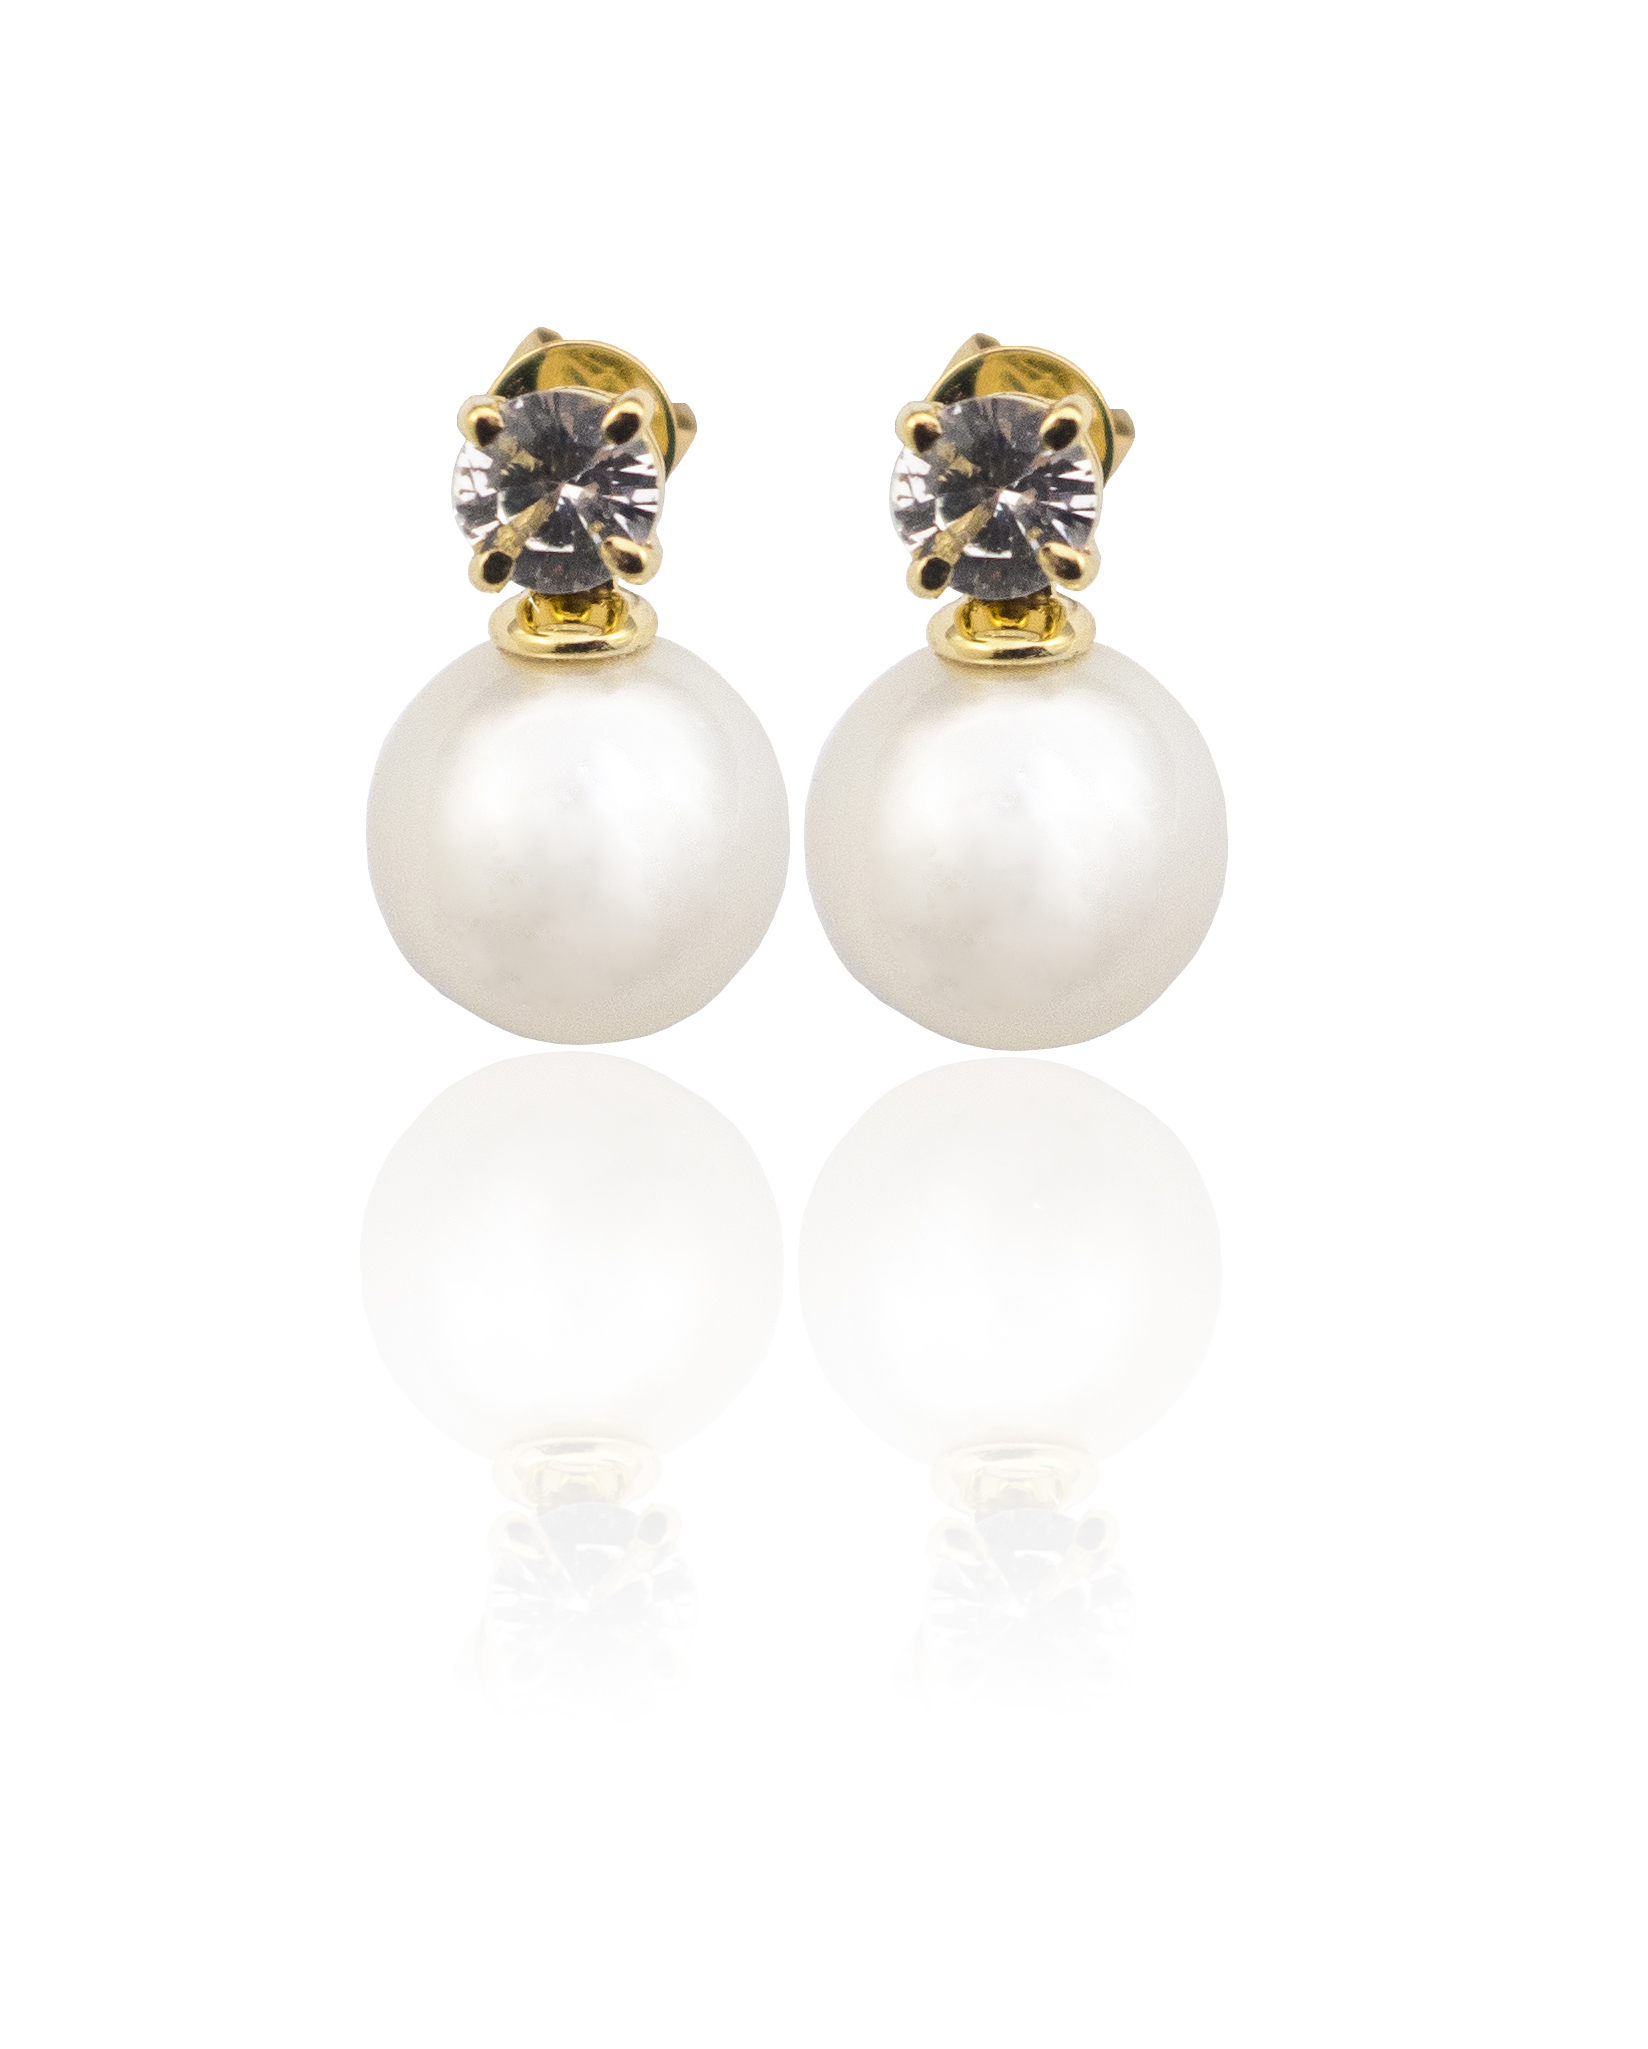 South Sea pearl & Sapphire earrings!